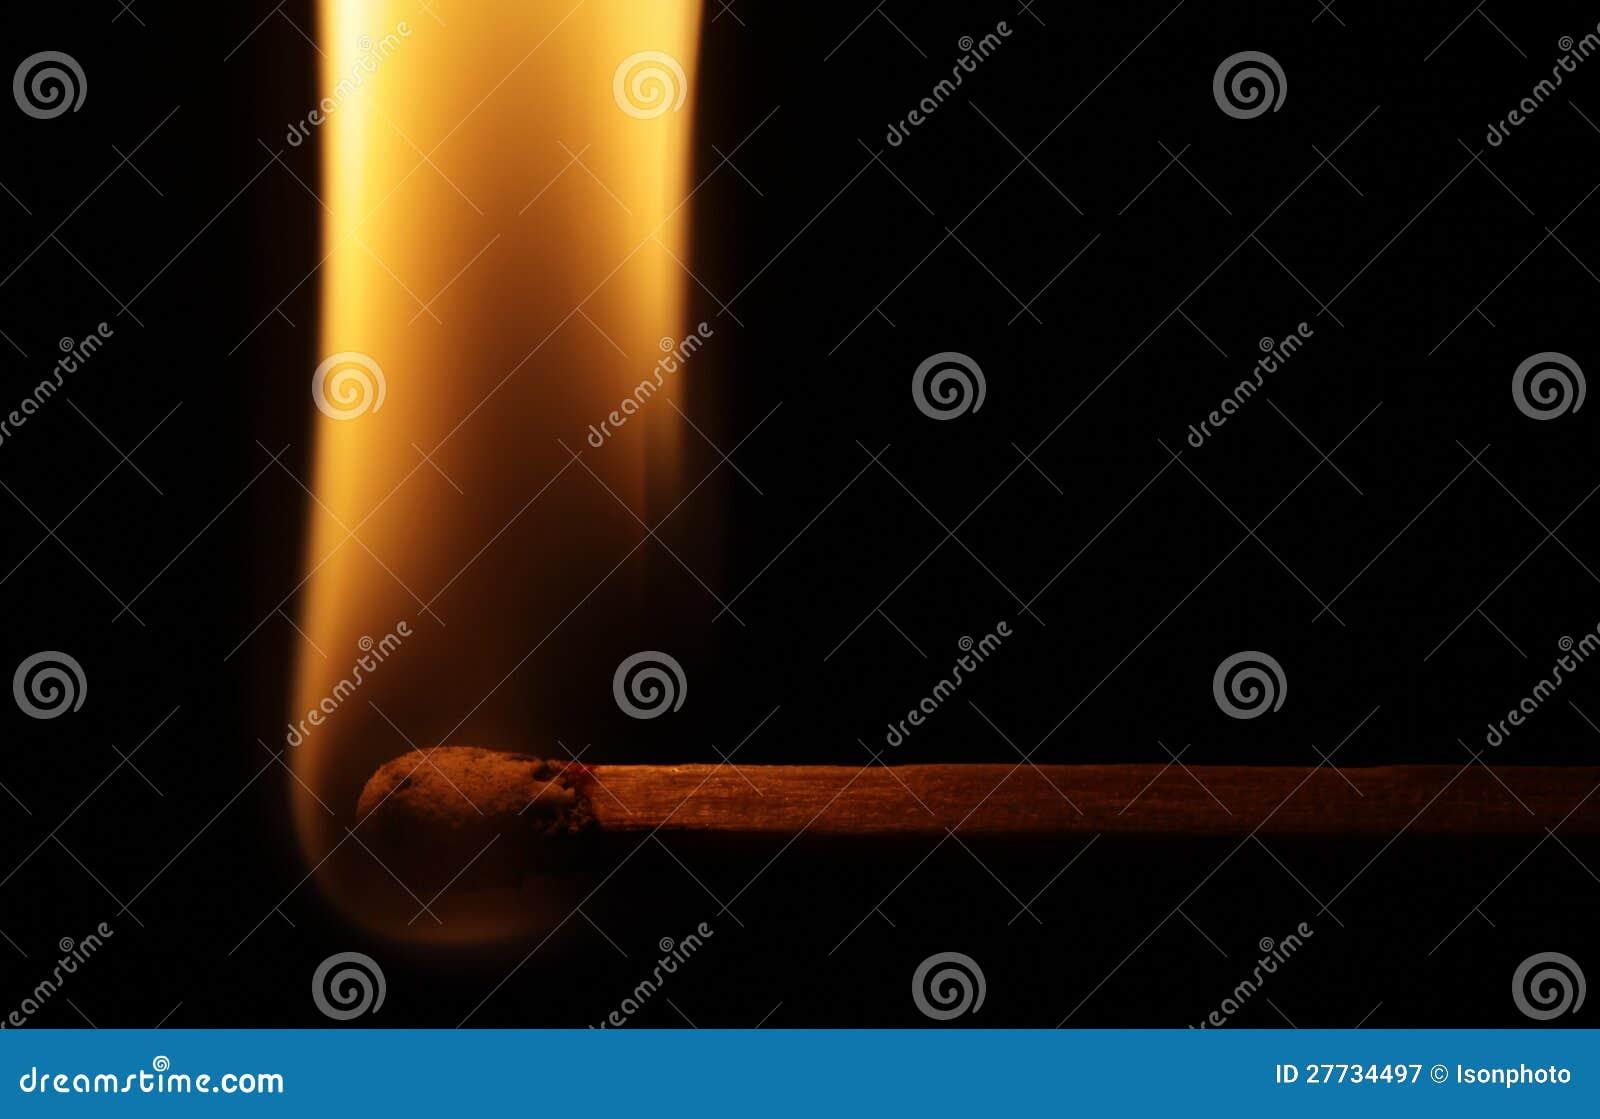 Horizontale Abgleichung mit Flamme